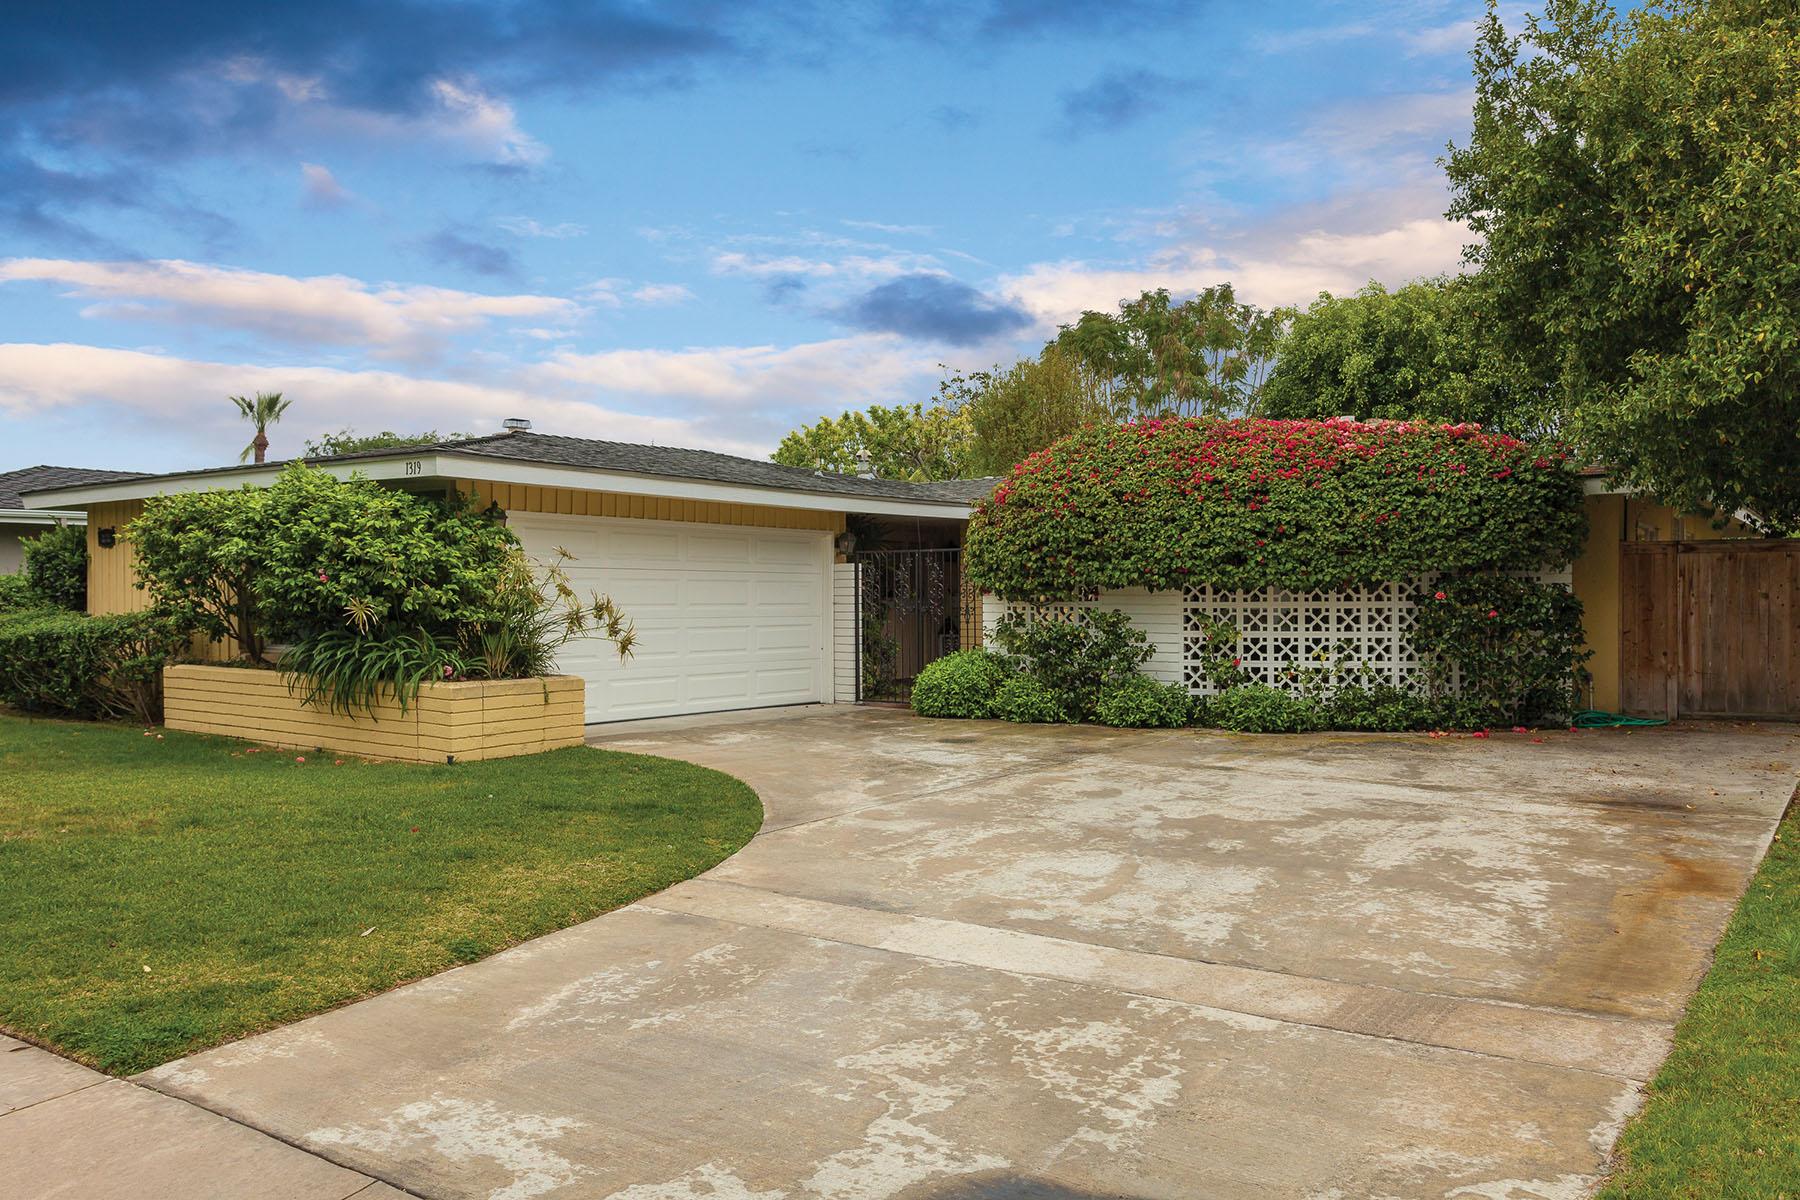 Single Family Home for Sale at 1319 Bonnie Doone Corona Del Mar, California, 92625 United States